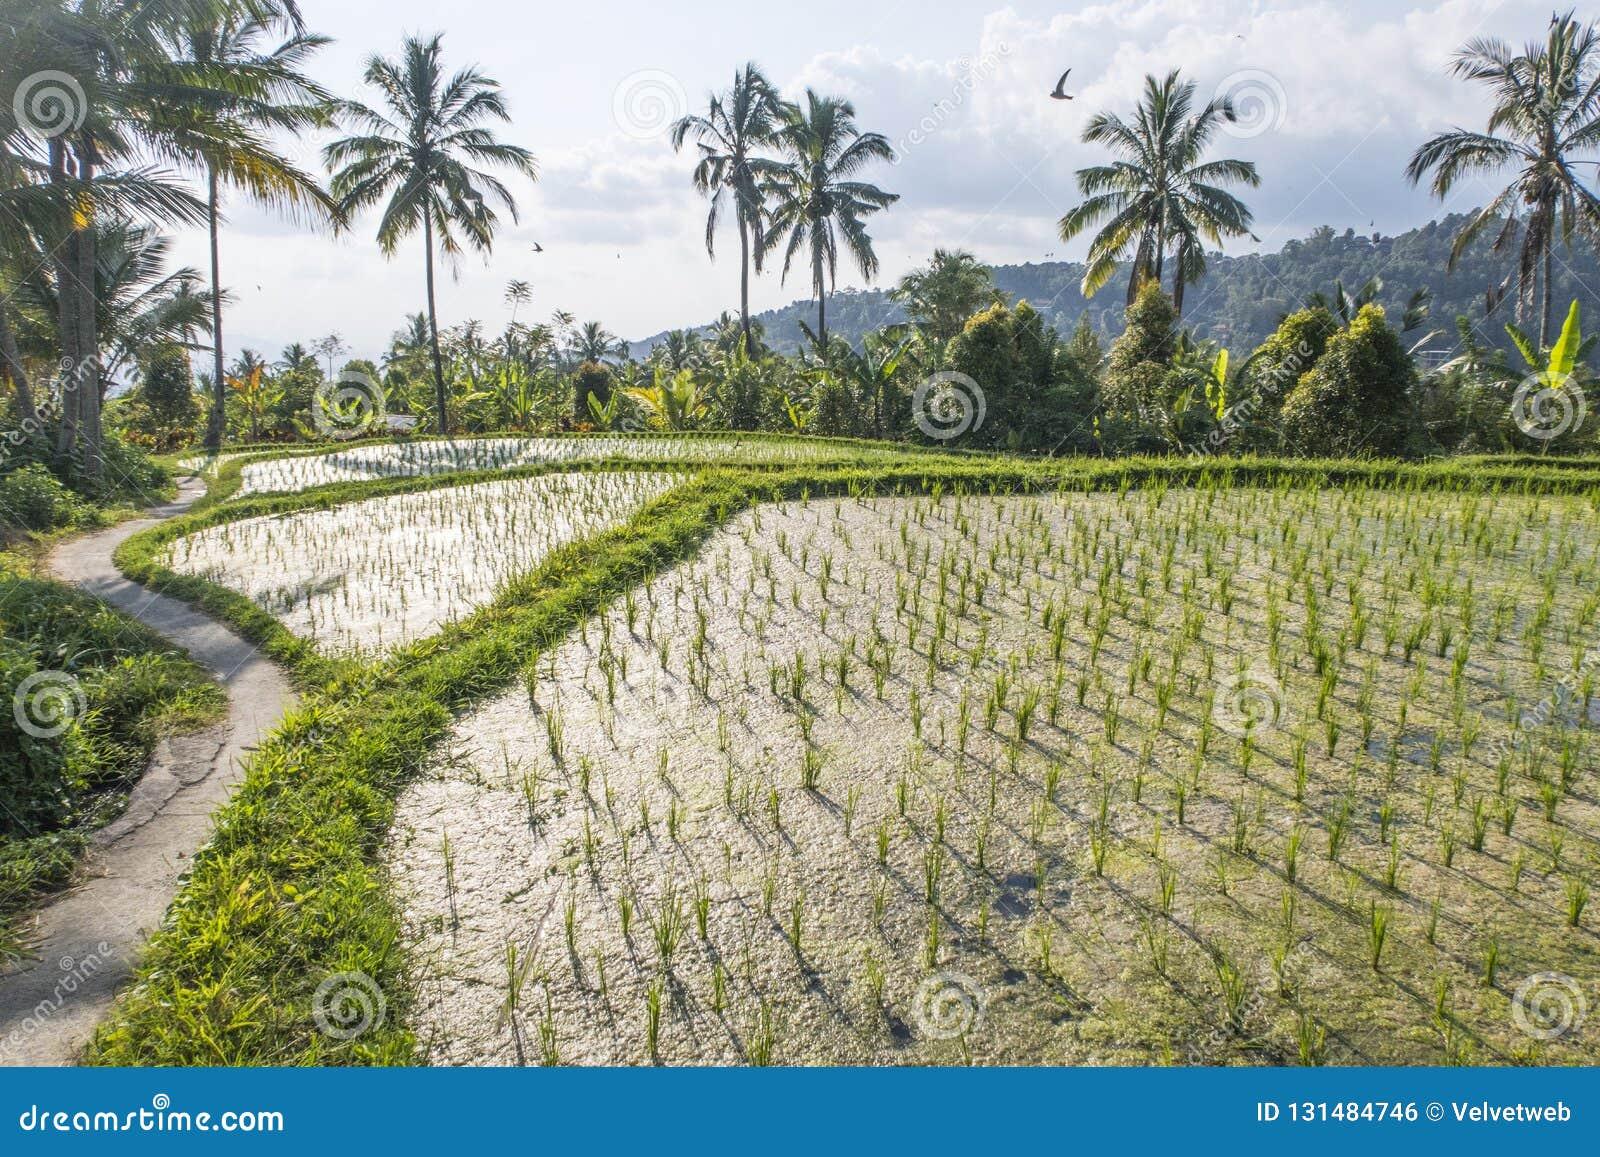 Jatiluwih Rice Terraces Bali Indonesia Stock Photo Image Of Farm